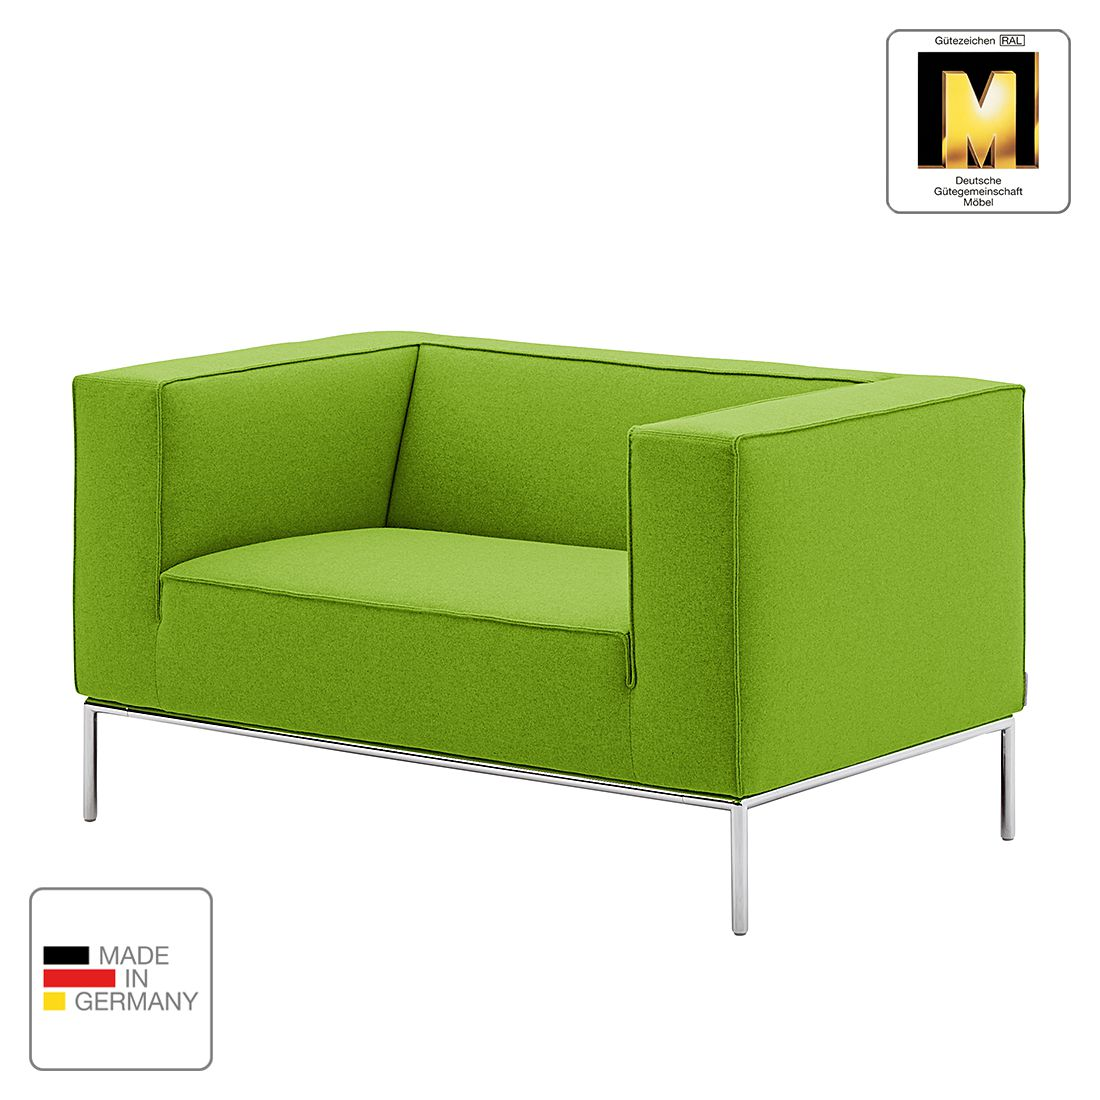 Sessel Greg - Webstoff - Grün - 1 Kissen, Machalke Polsterwerkstätten